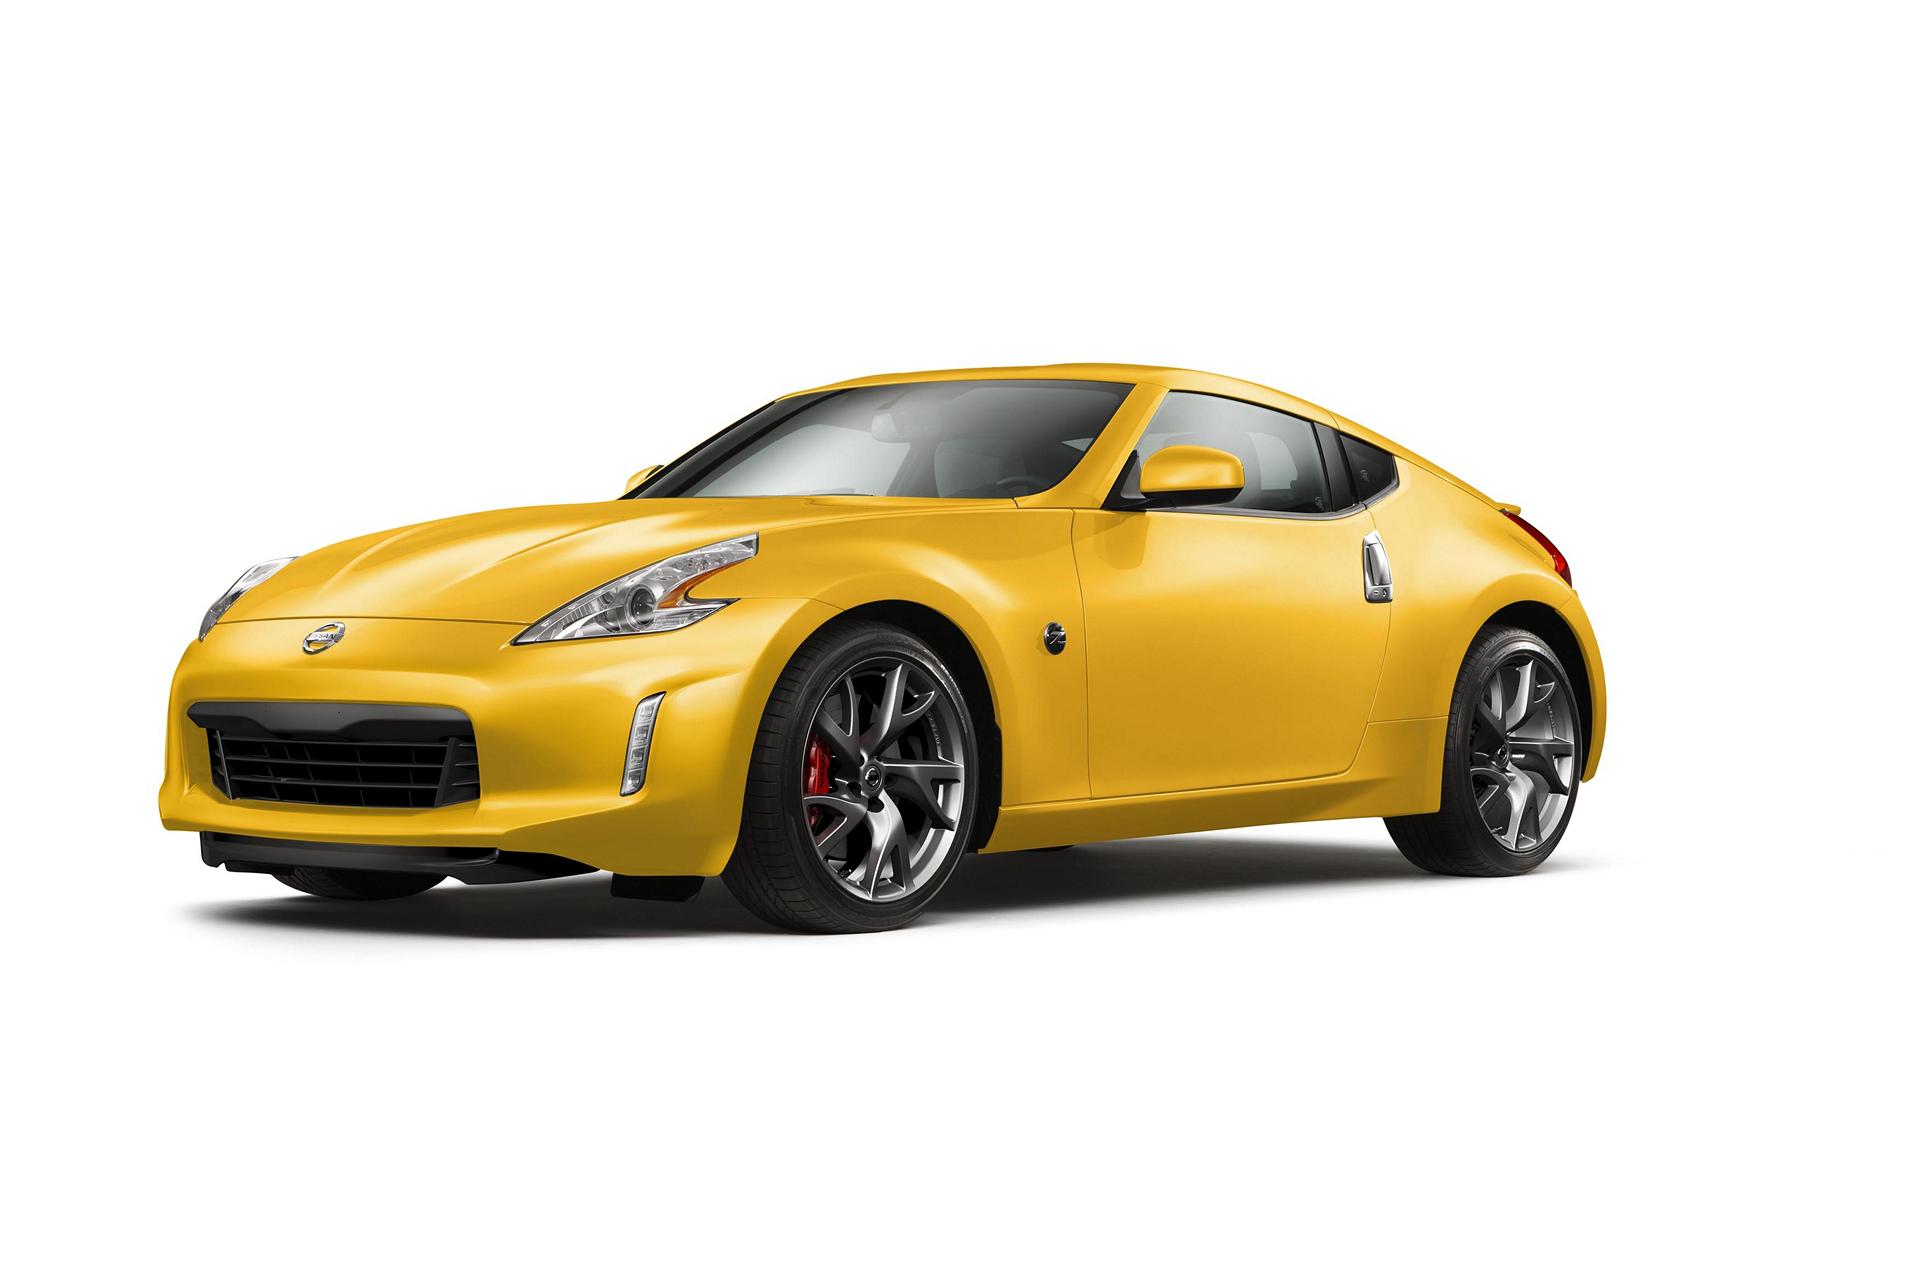 2017 Nissan 370Z Coupe © Nissan Motor Co., Ltd.